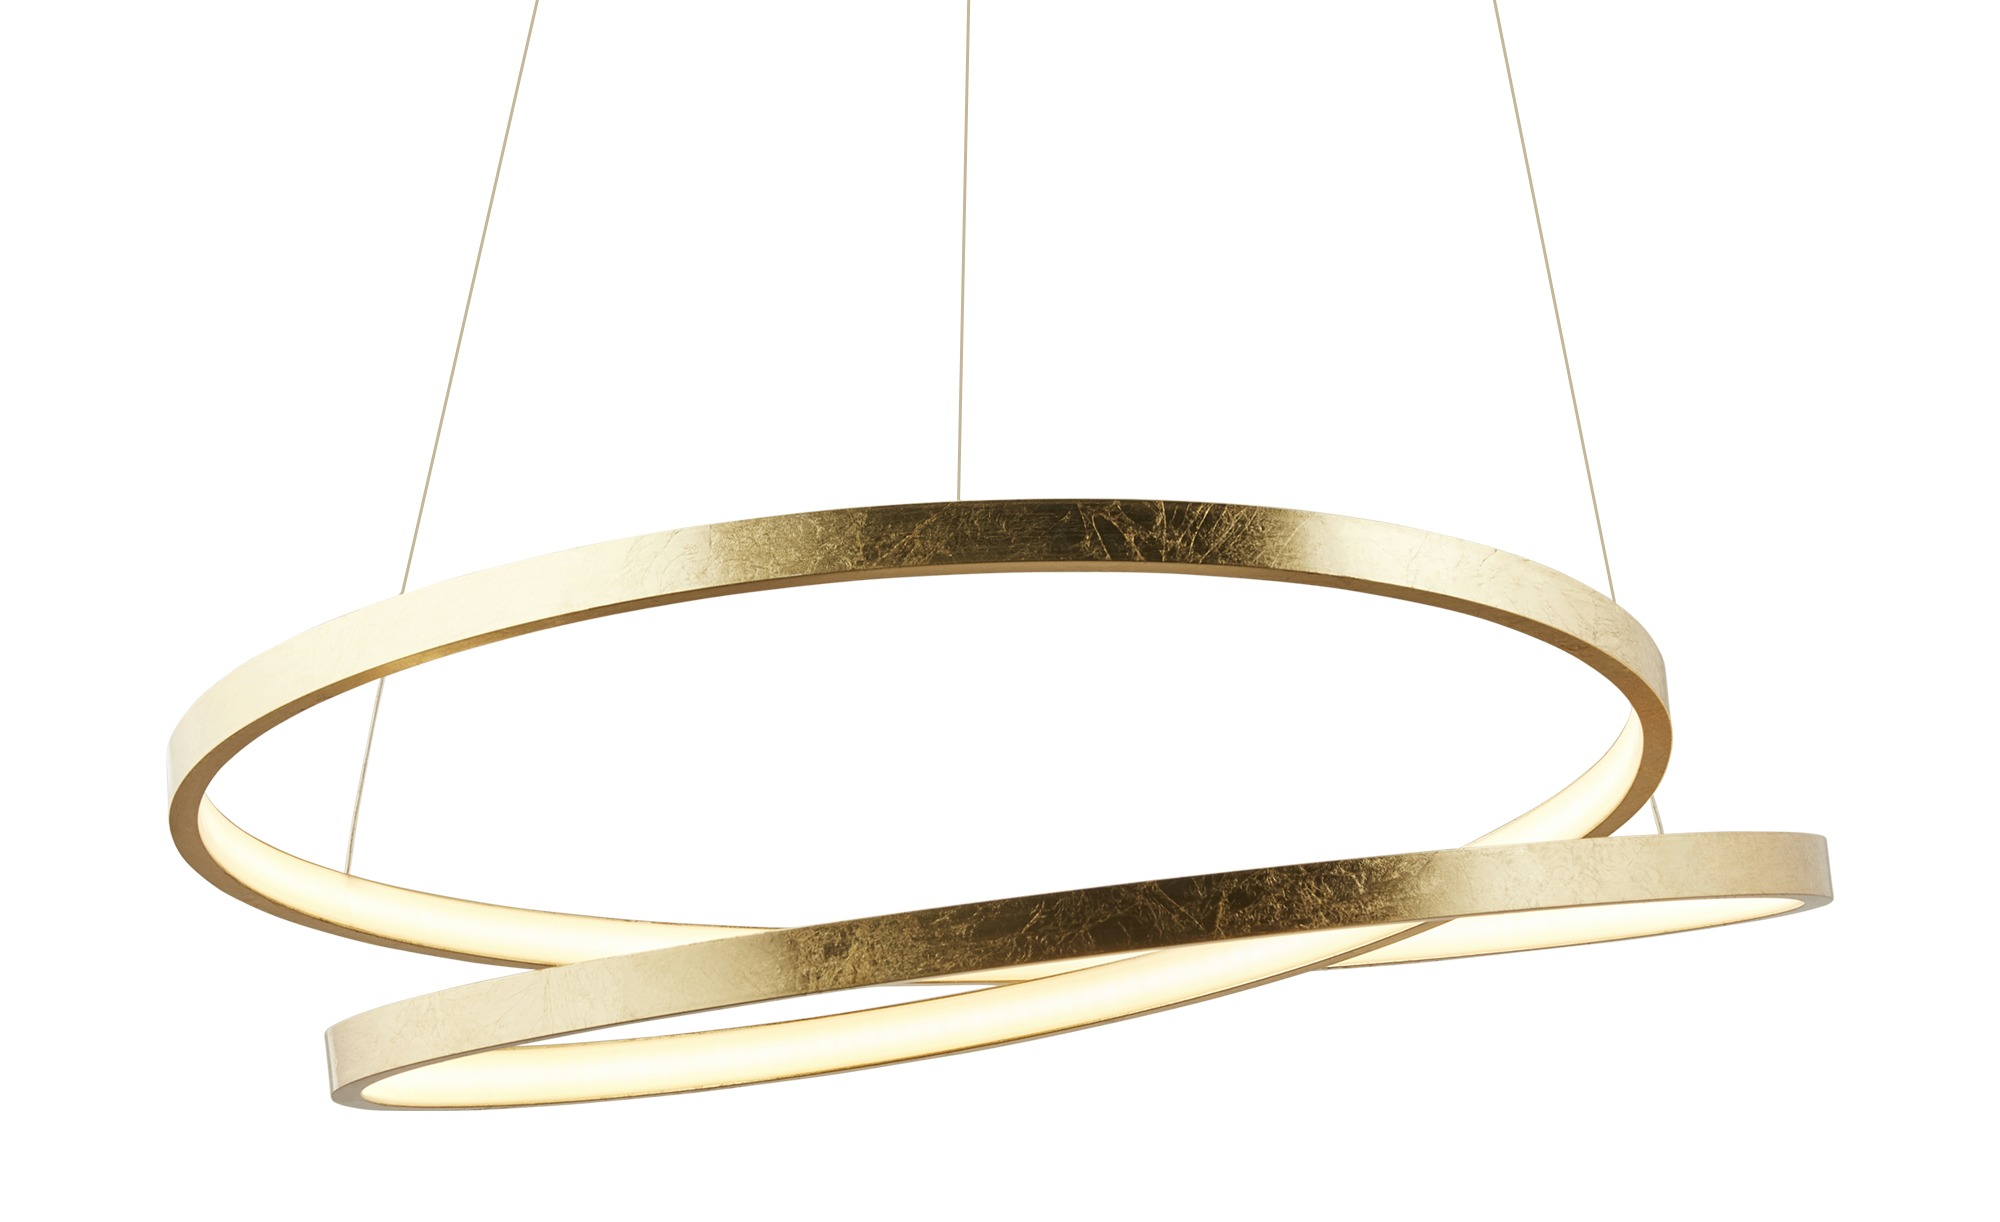 Paul Neuhaus LED-Pendelleuchte, 1-flammig, goldfarben ¦ gold ¦ Maße (cm): H: 120 Ø: 55 Lampen & Leuchten > LED-Leuchten > LED-Pendelleuchten - Höffner